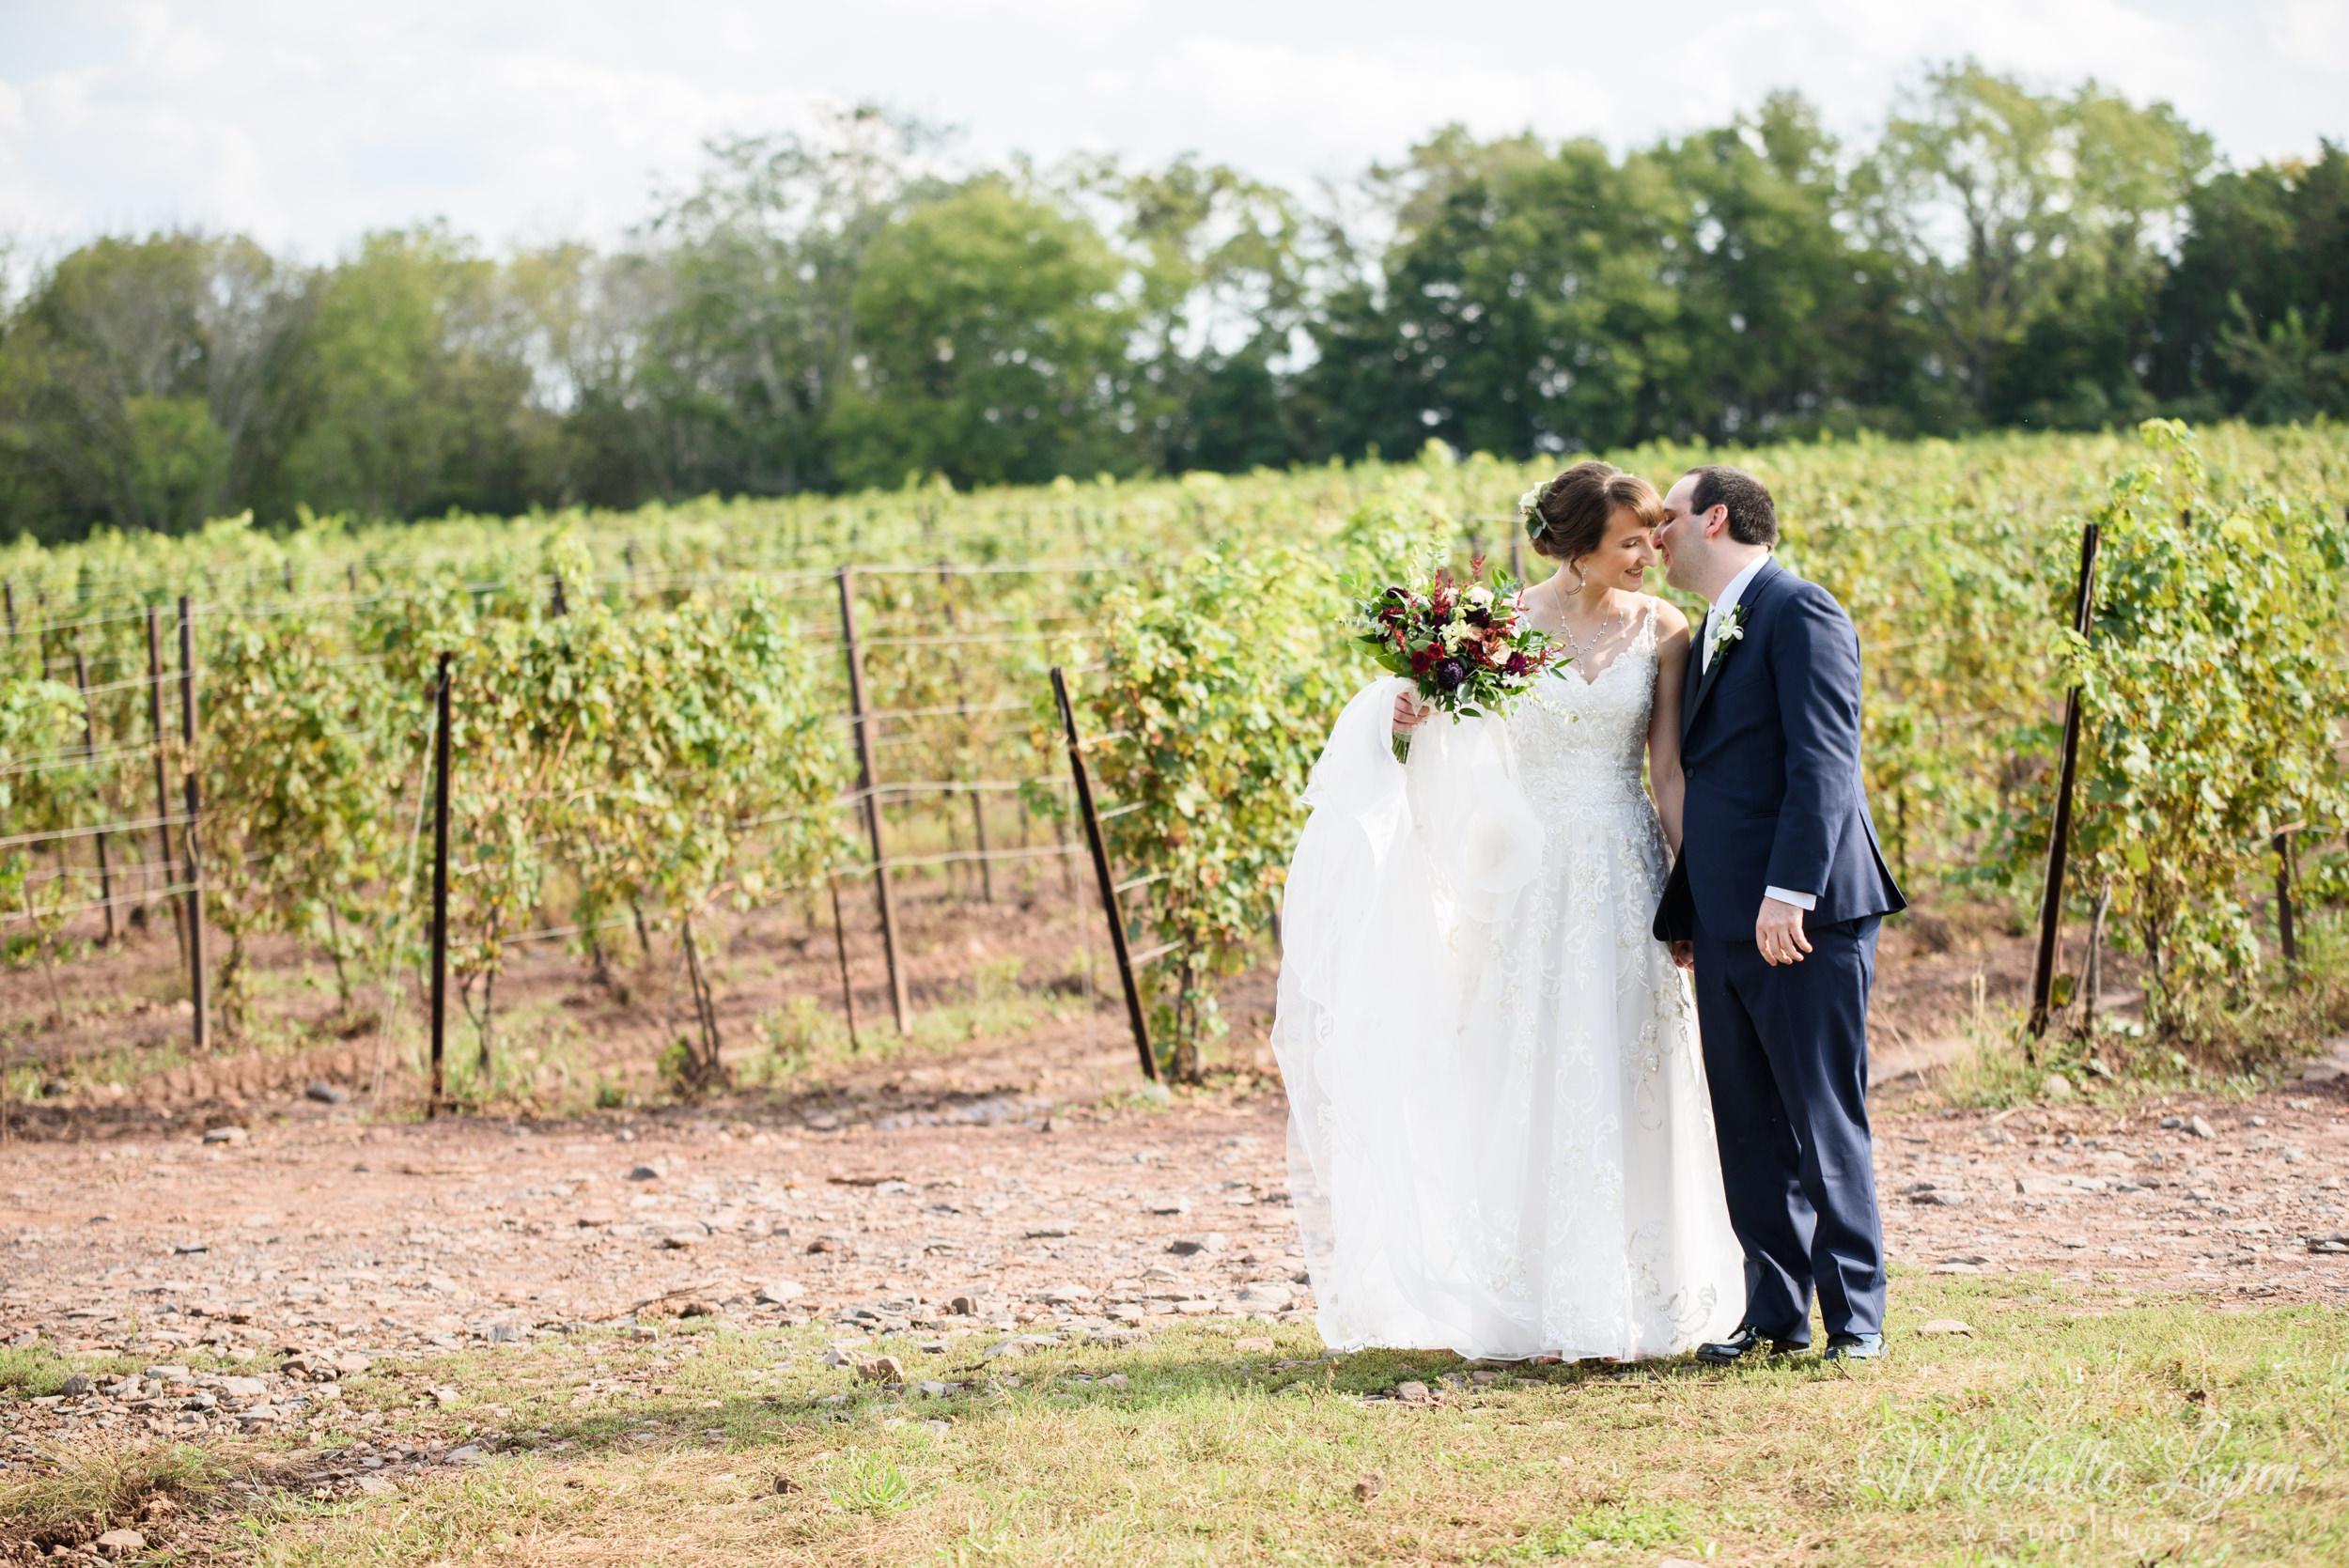 sand-castle-winery-pennsylvania-wedding-photography-35.jpg